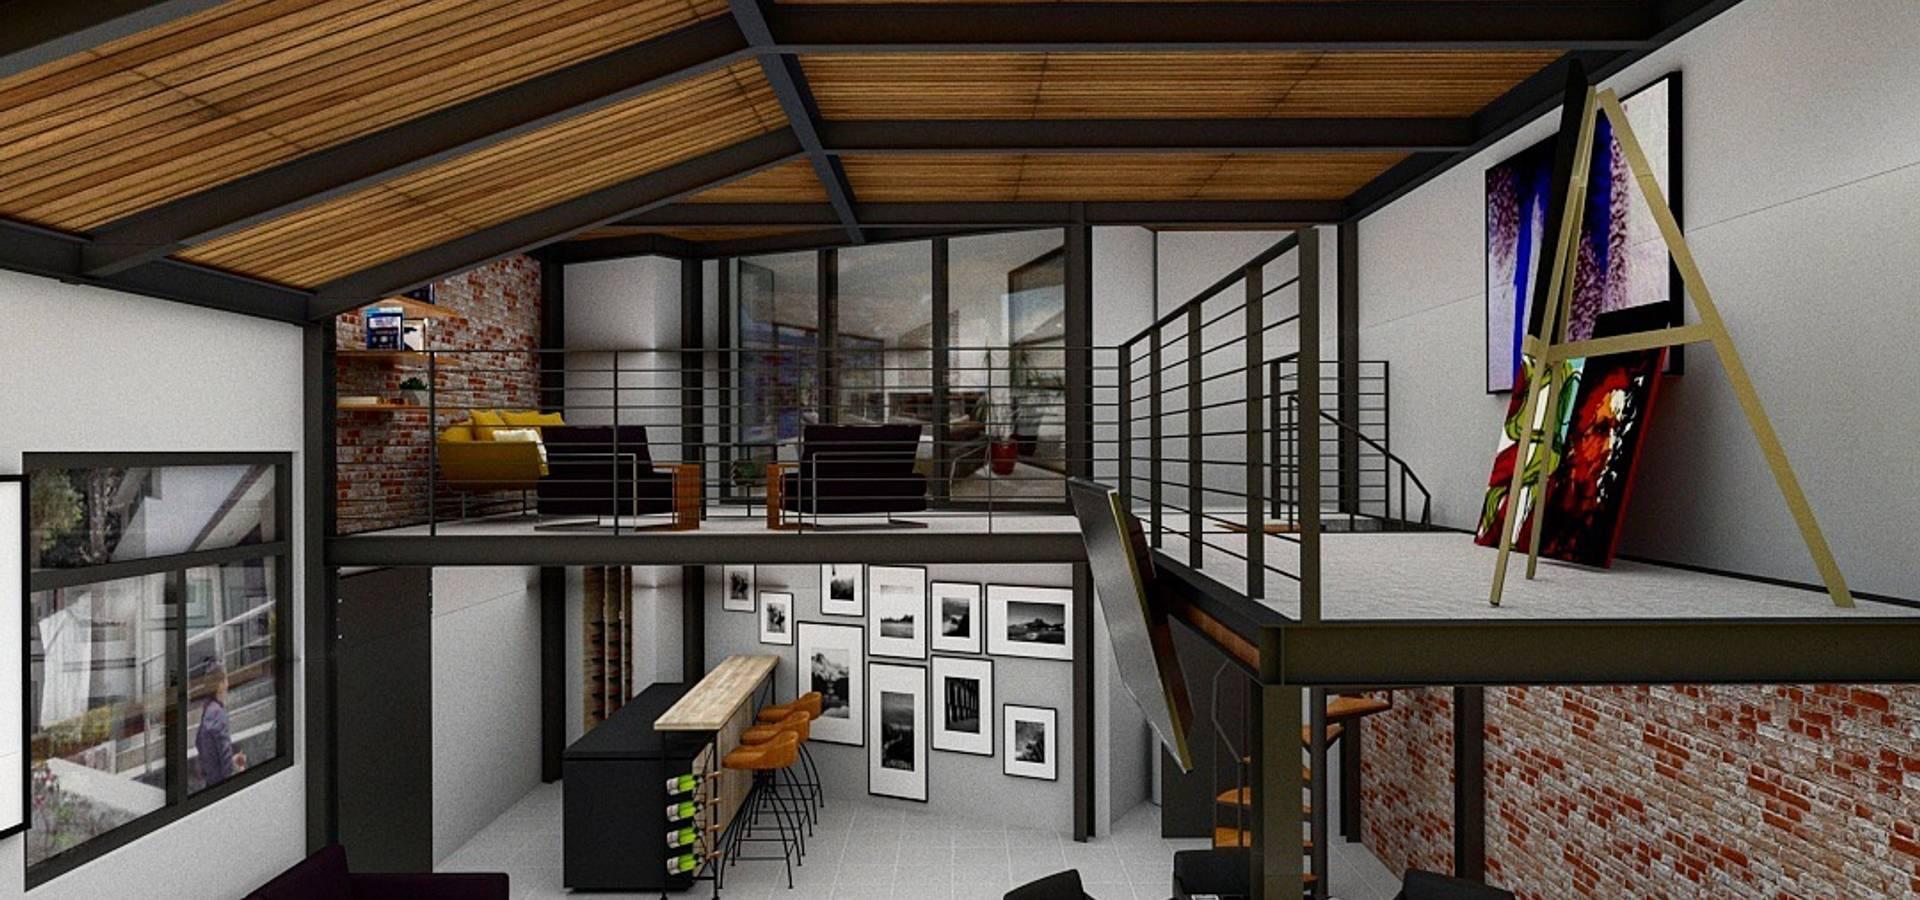 Integra Arquitectos Arquitectos En Naucalpan De Juarez Homify # Muebles Naucalpan Juarez